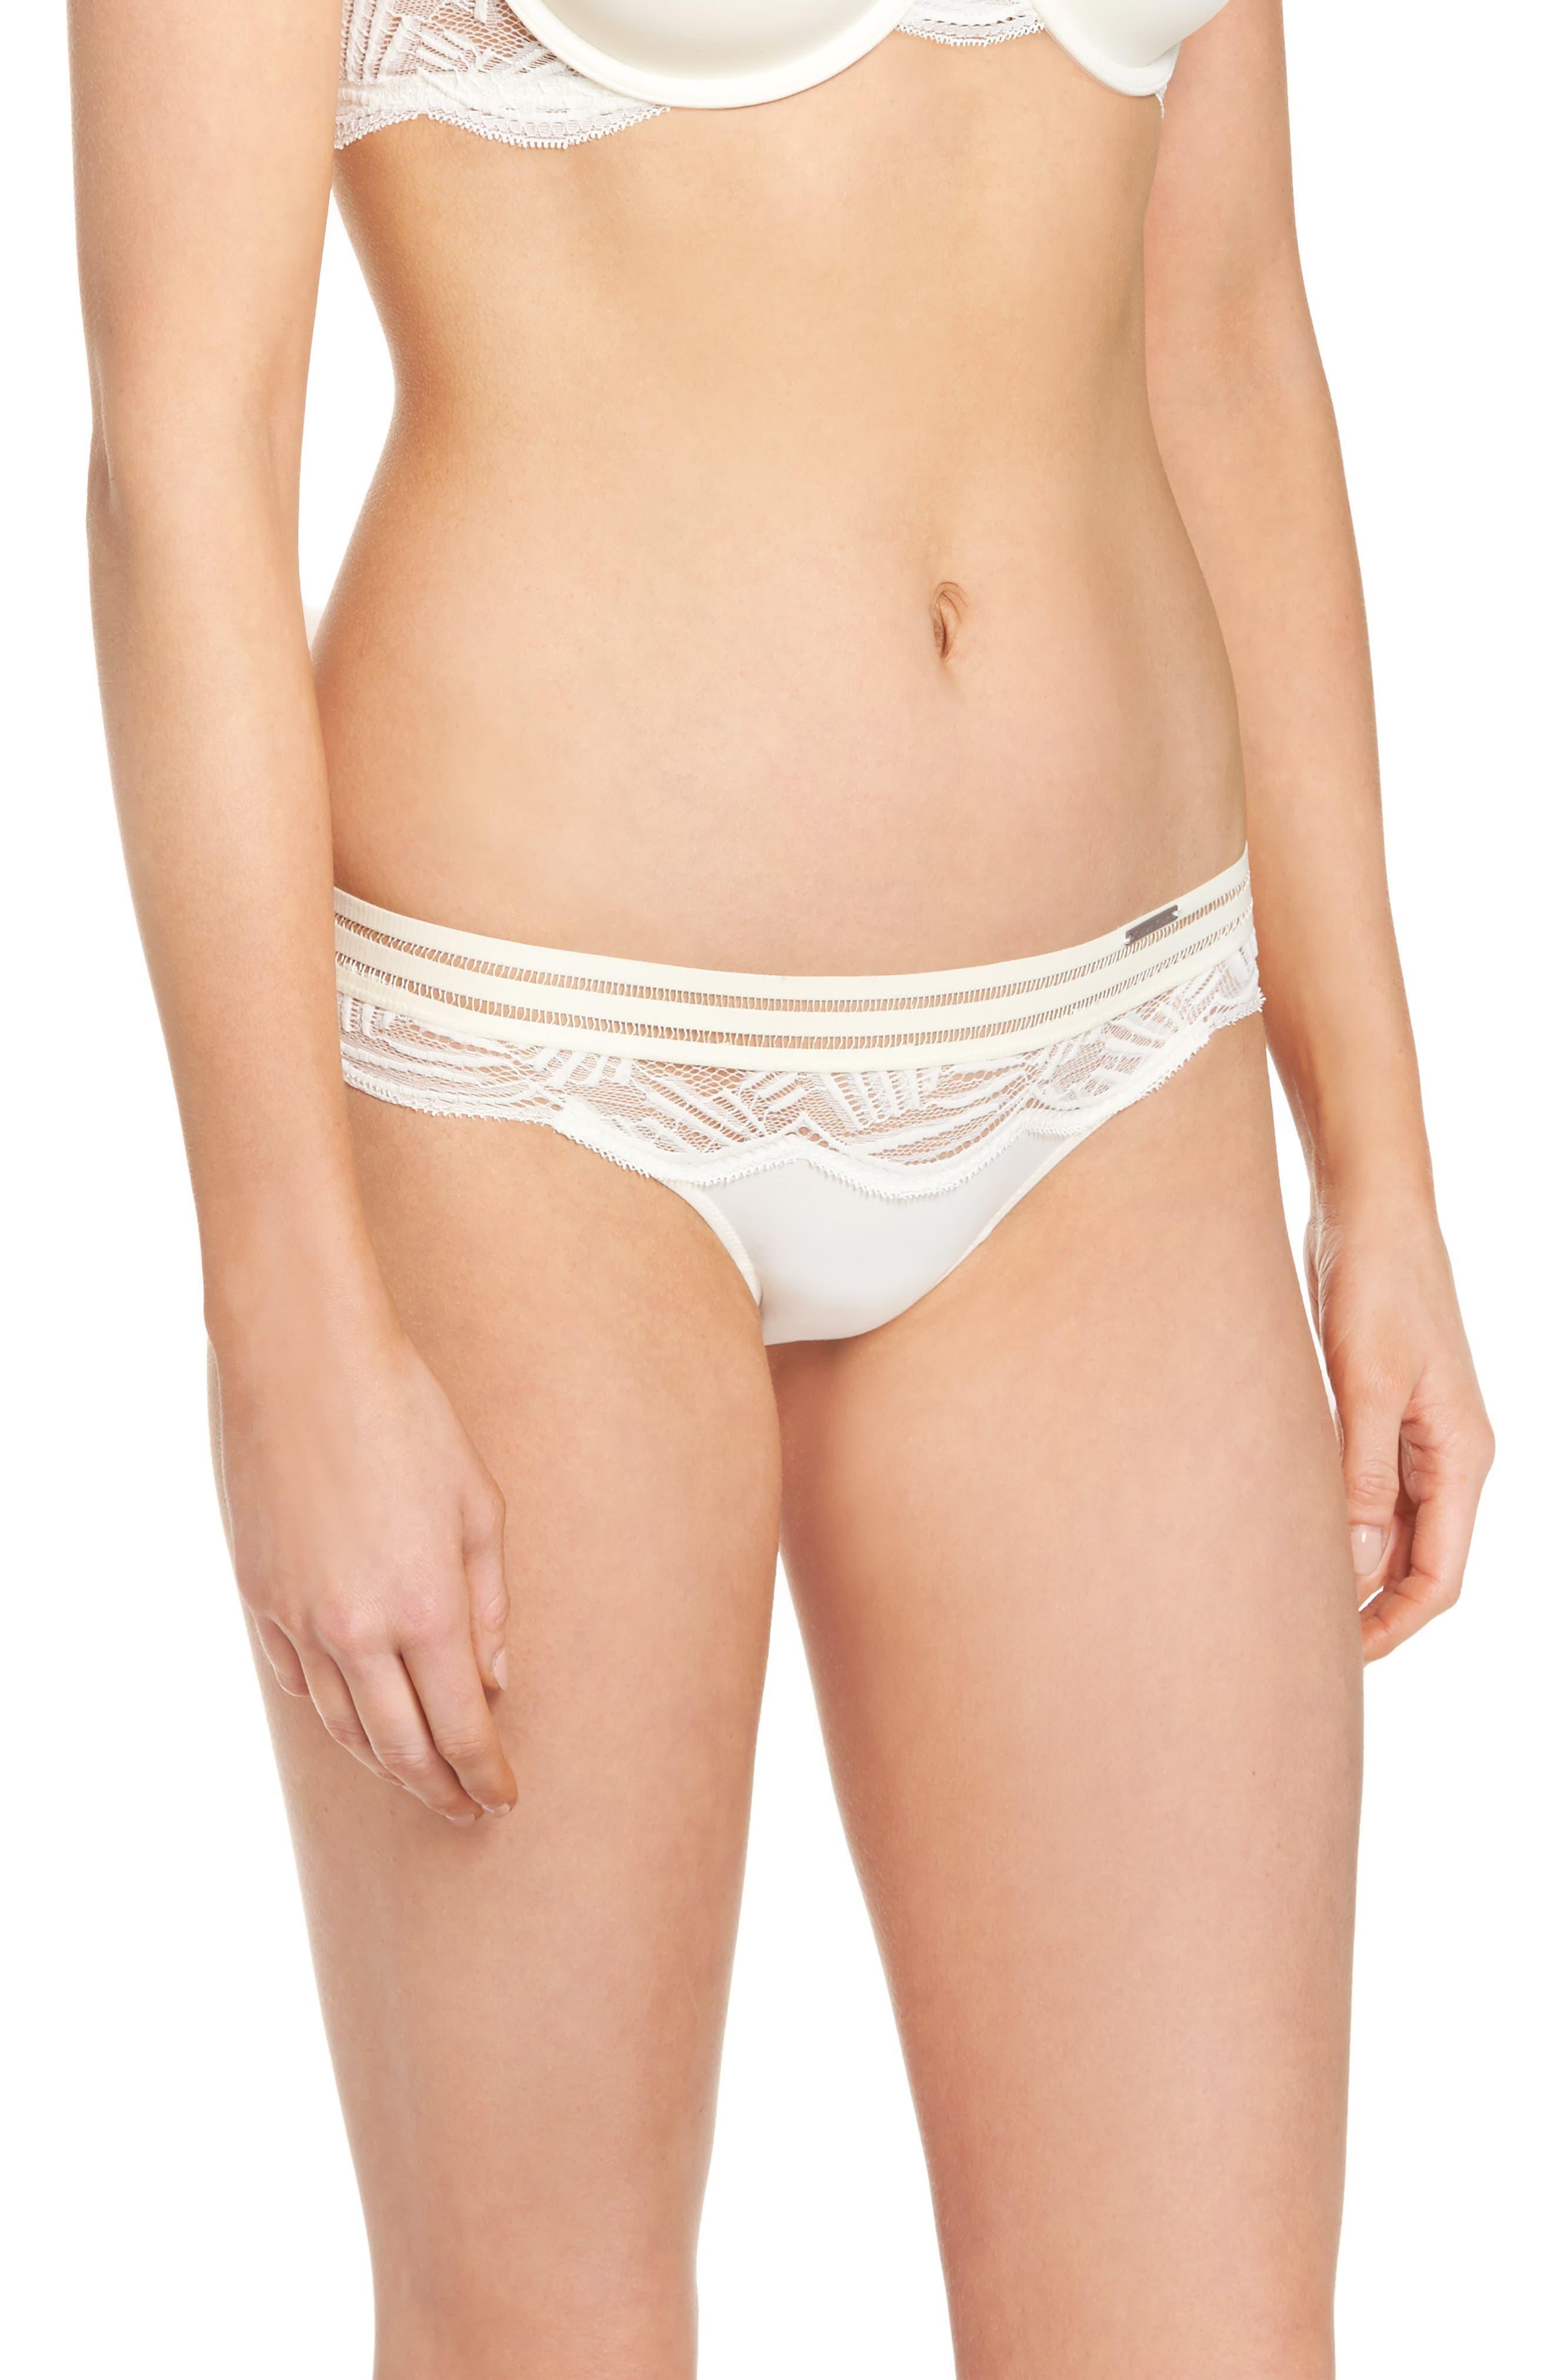 PF Slipcover Bikini,                             Alternate thumbnail 6, color,